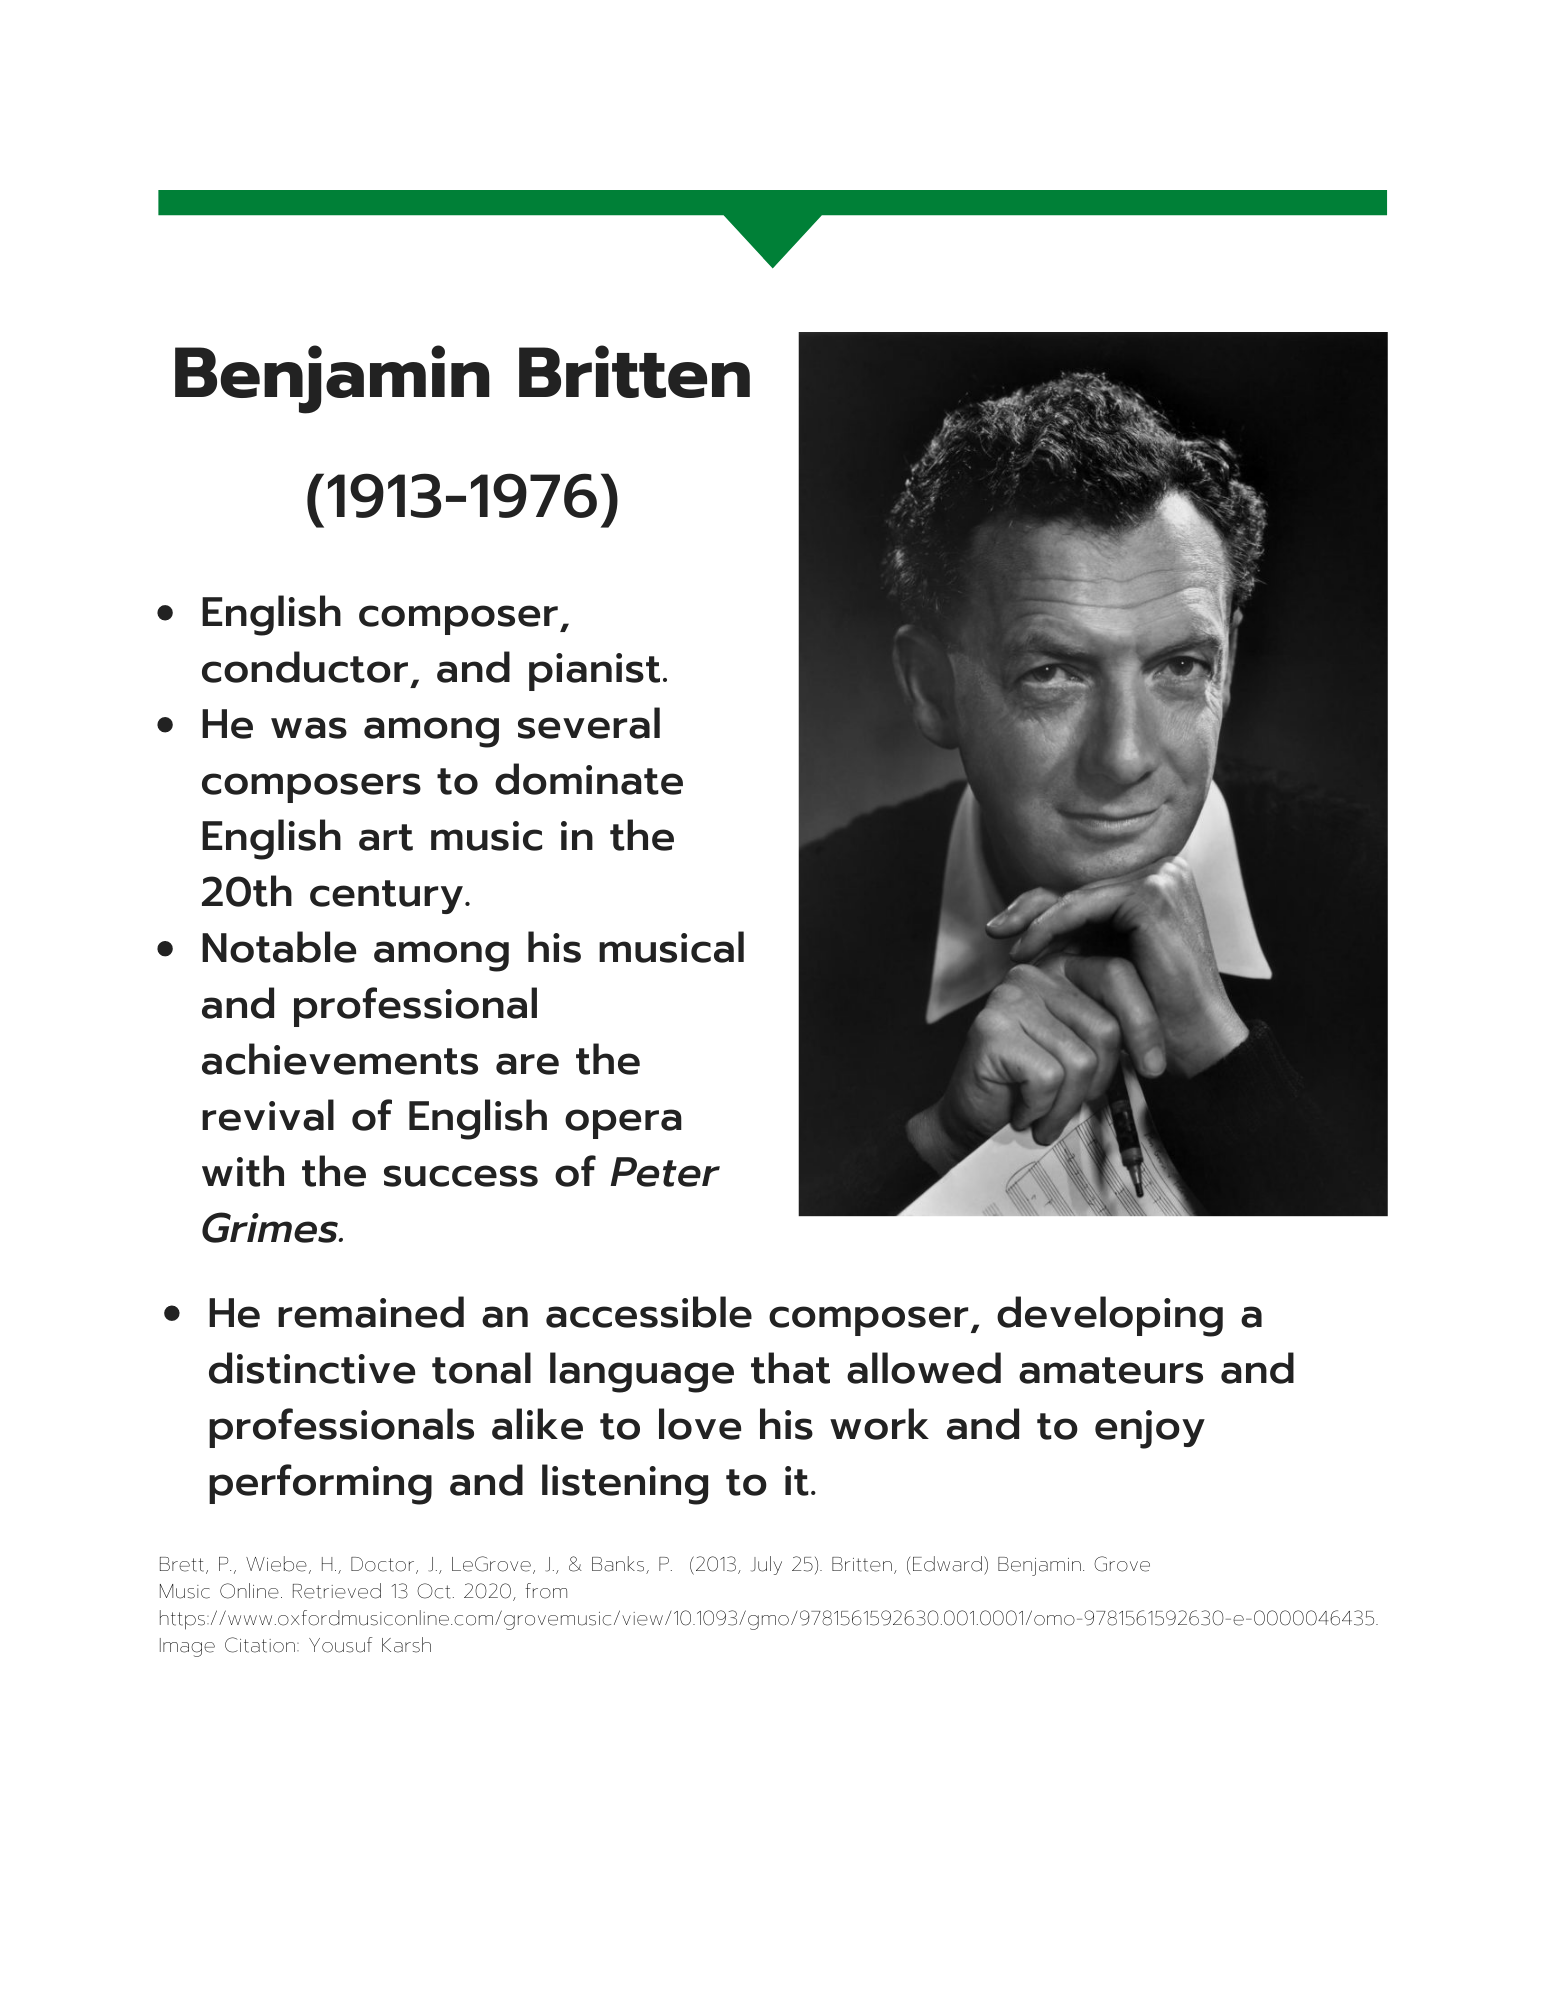 Benjamin Britten information sheet art